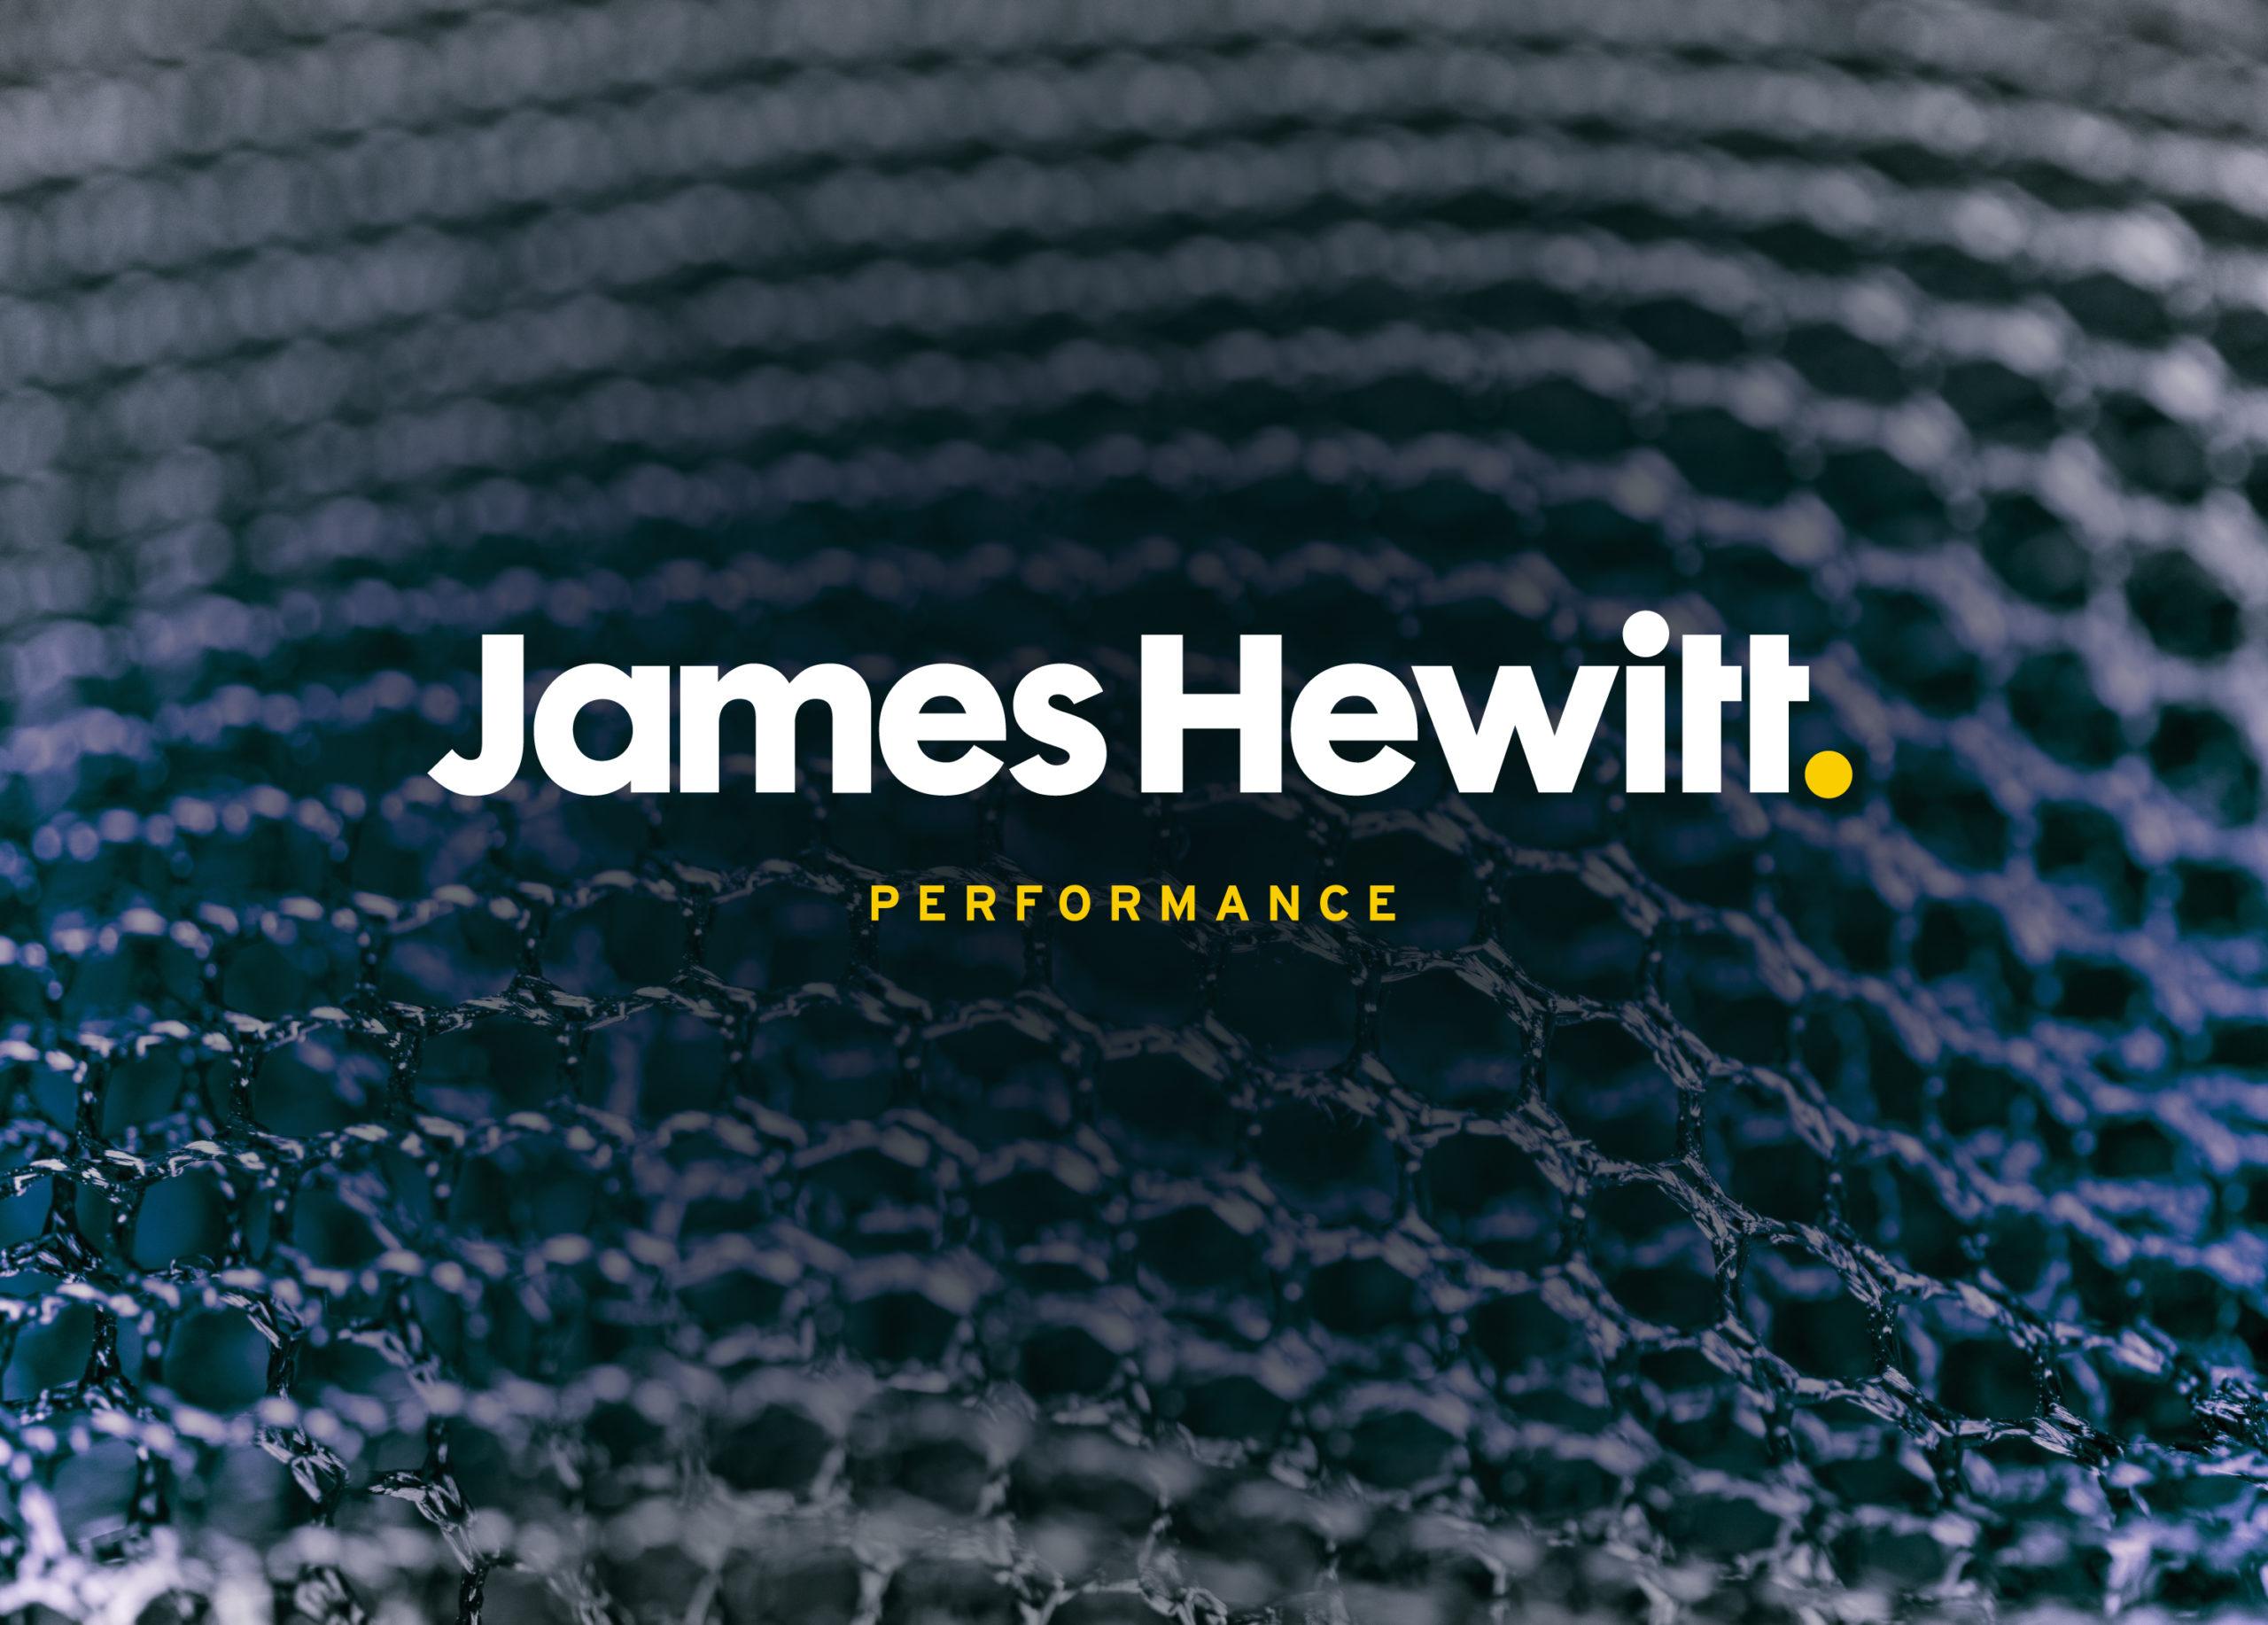 James Hewitt Performance branding